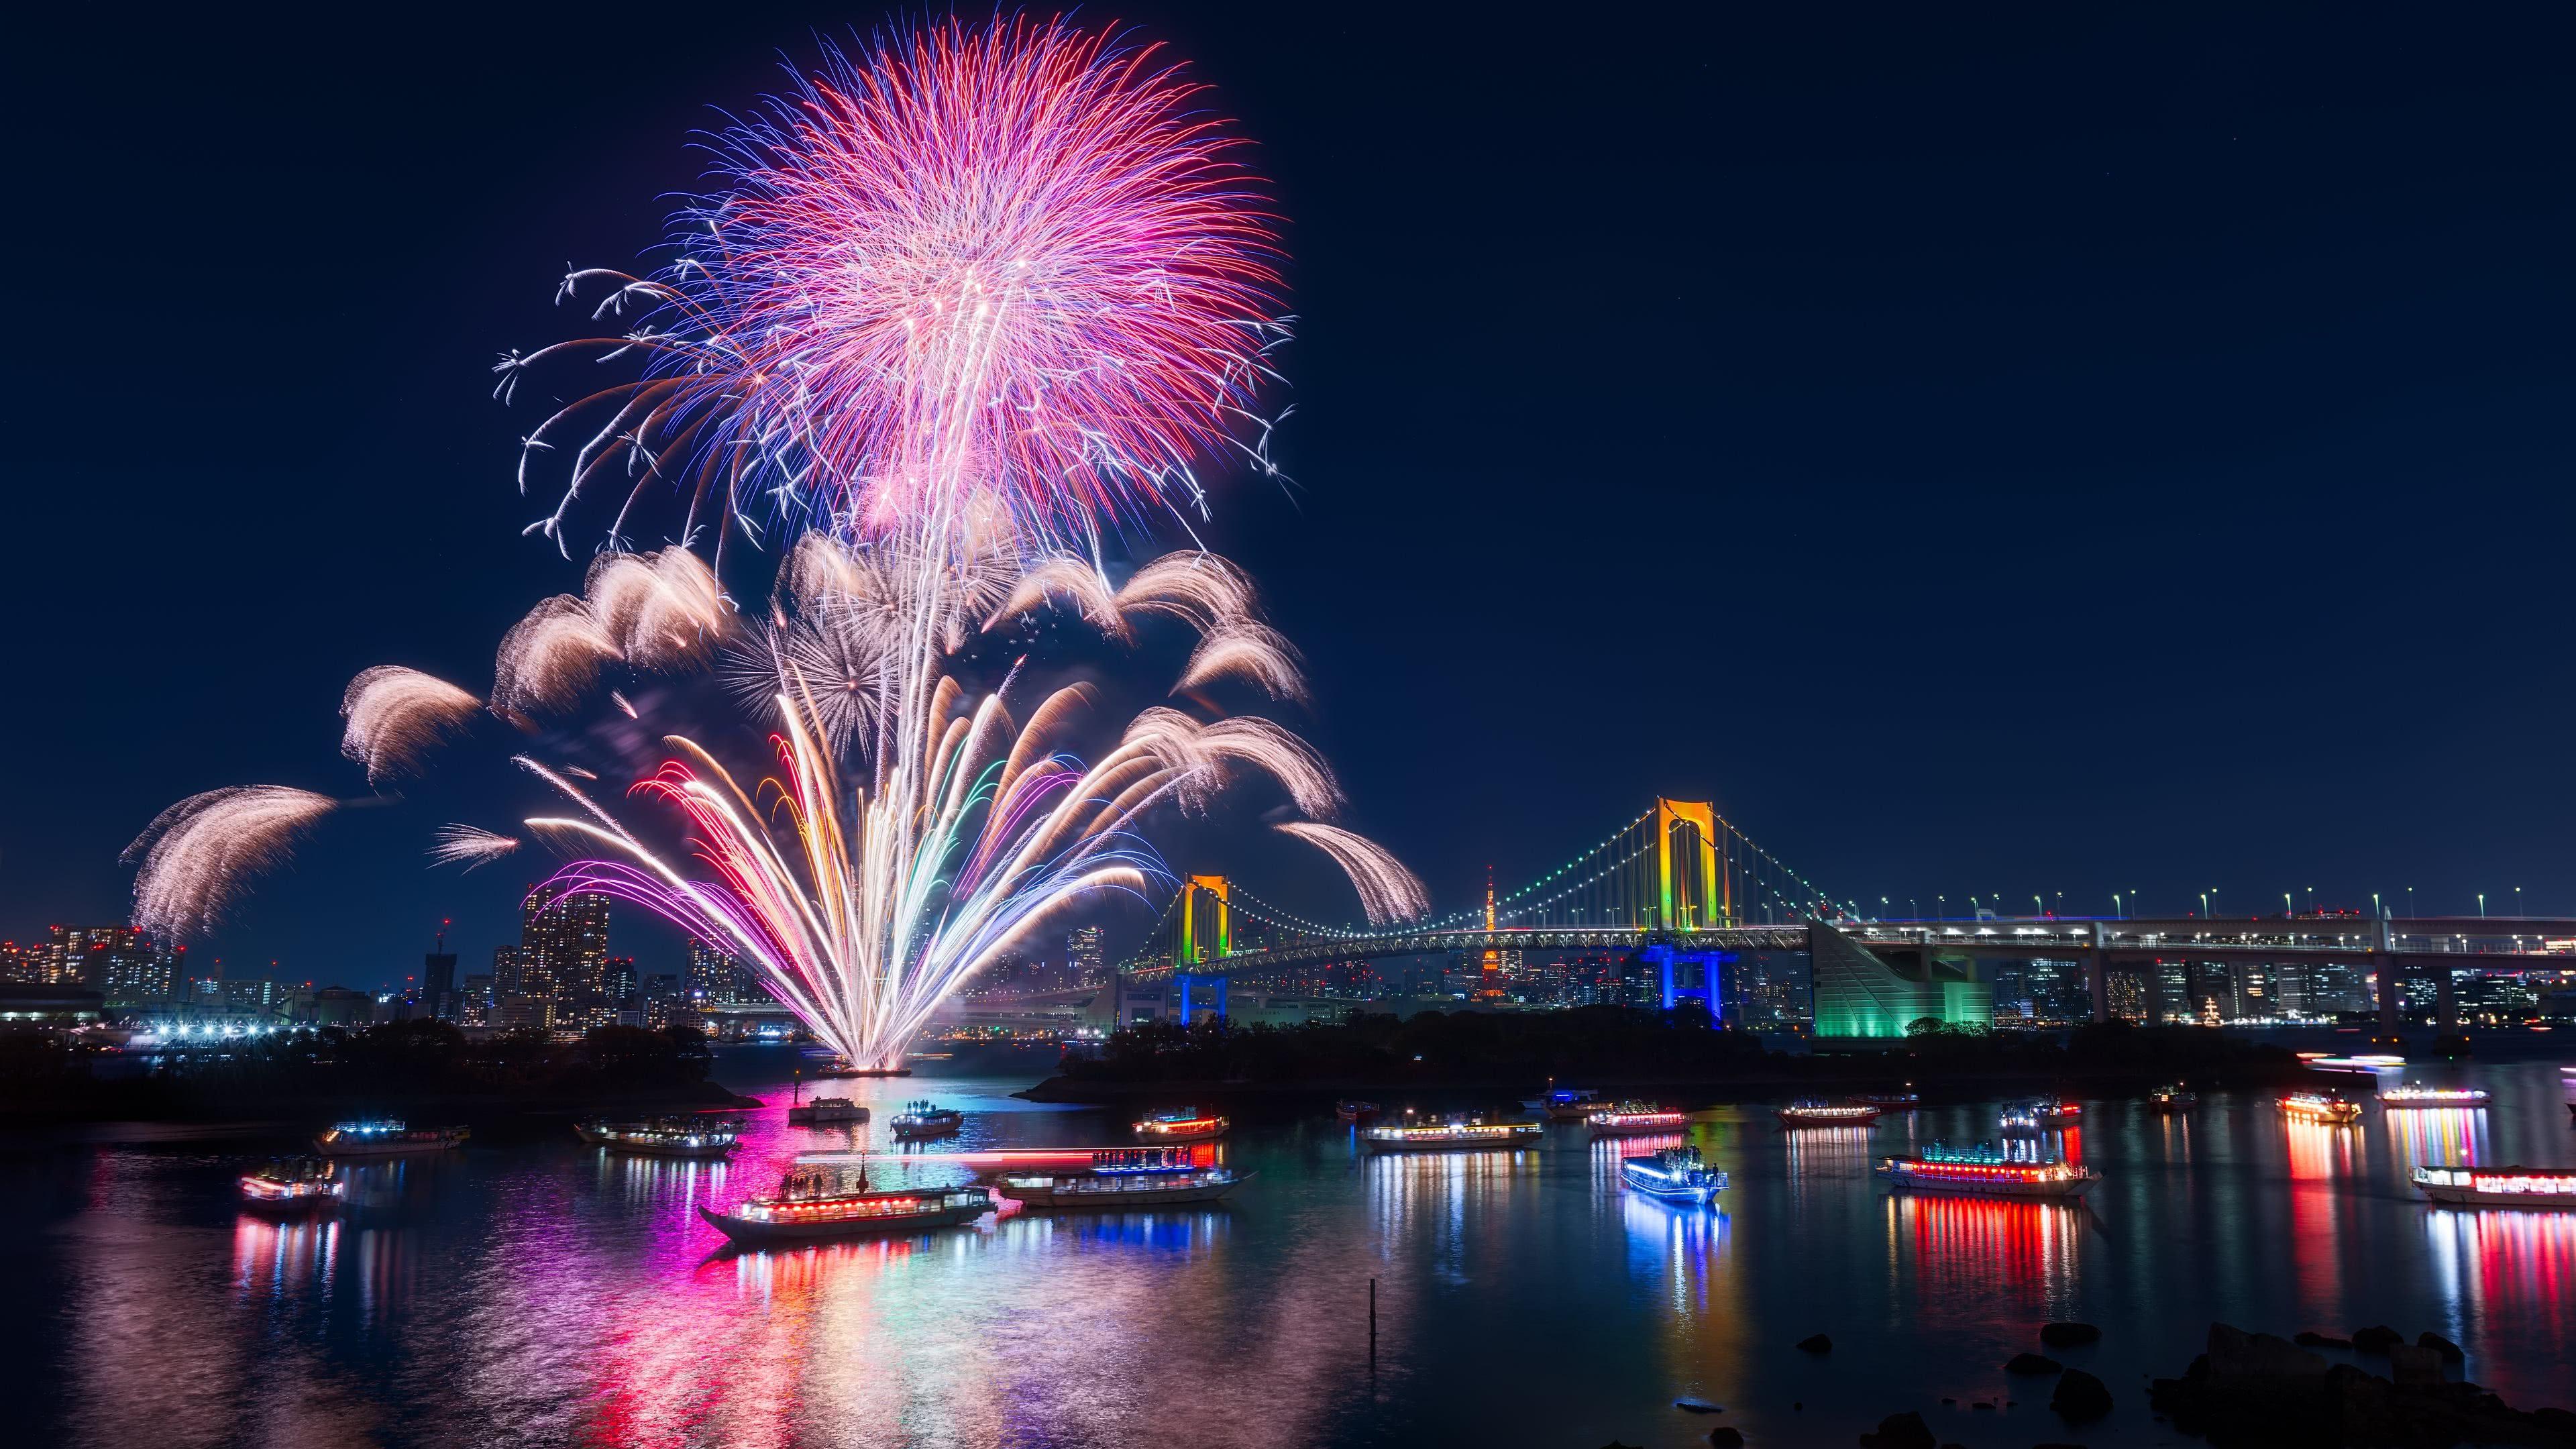 tokyo fireworks uhd 4k wallpaper